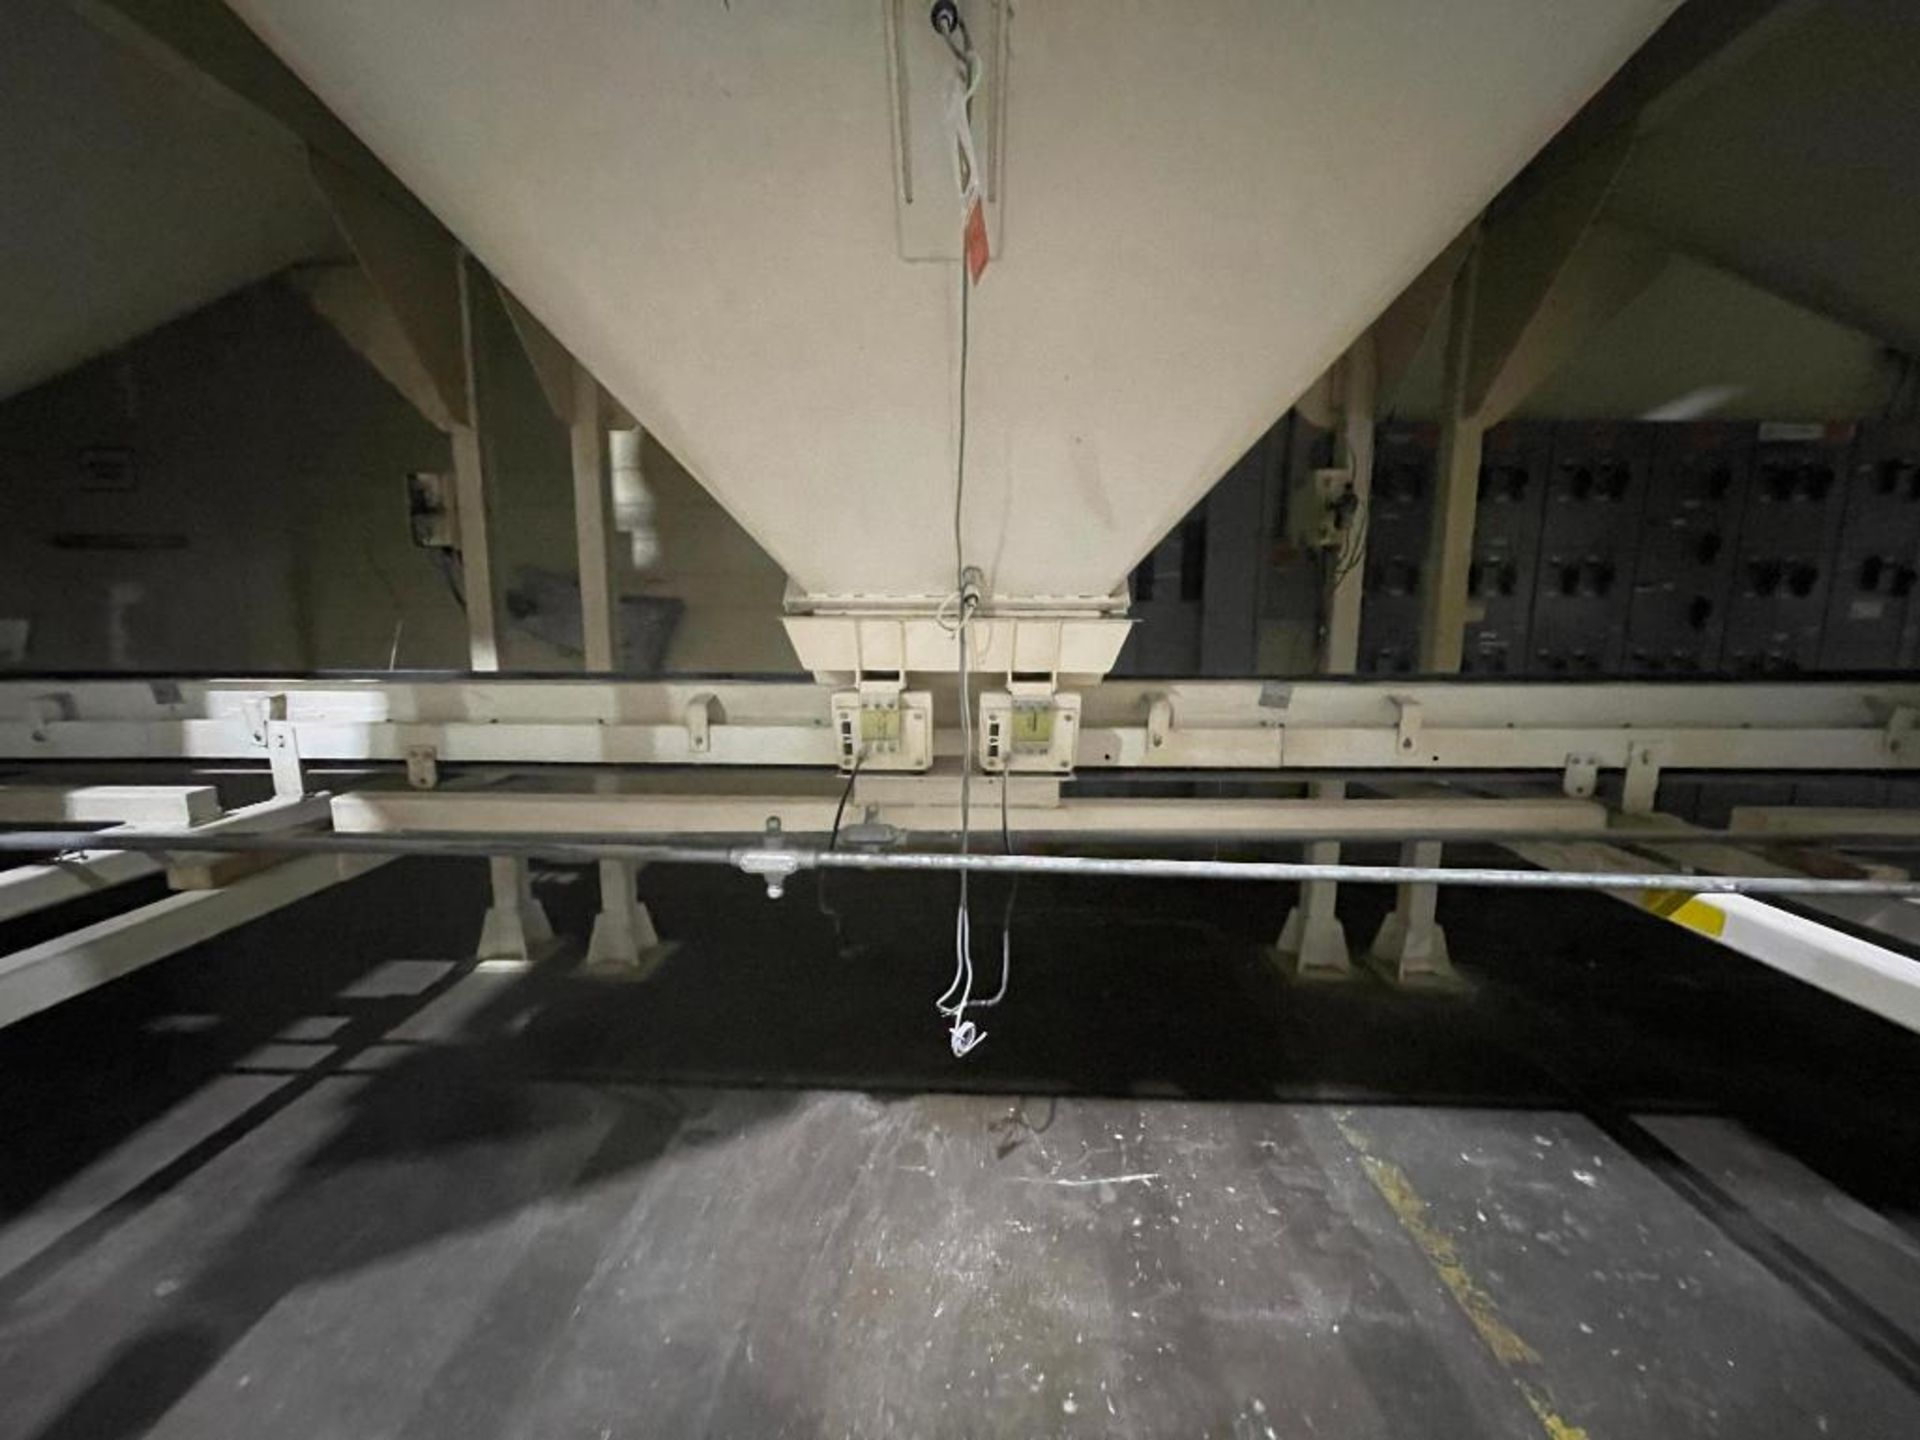 Aseeco mild steel cone bottom bulk storage bin - Image 7 of 28